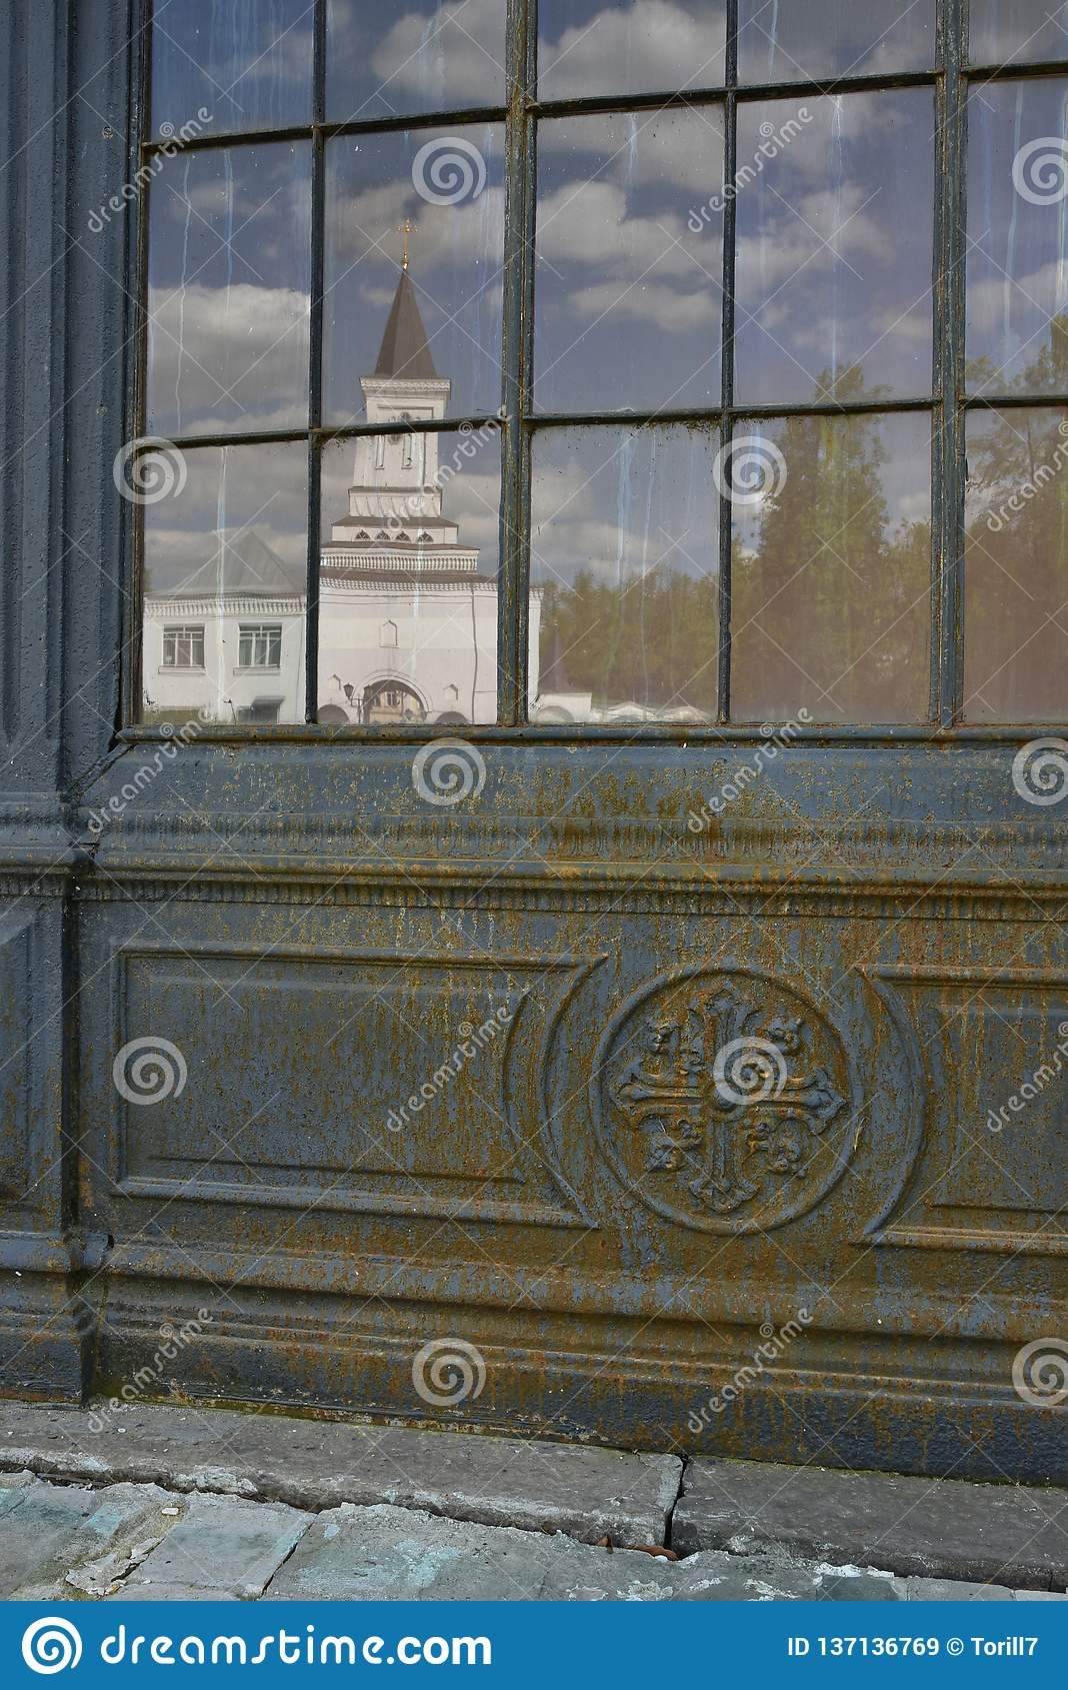 Window_to_church